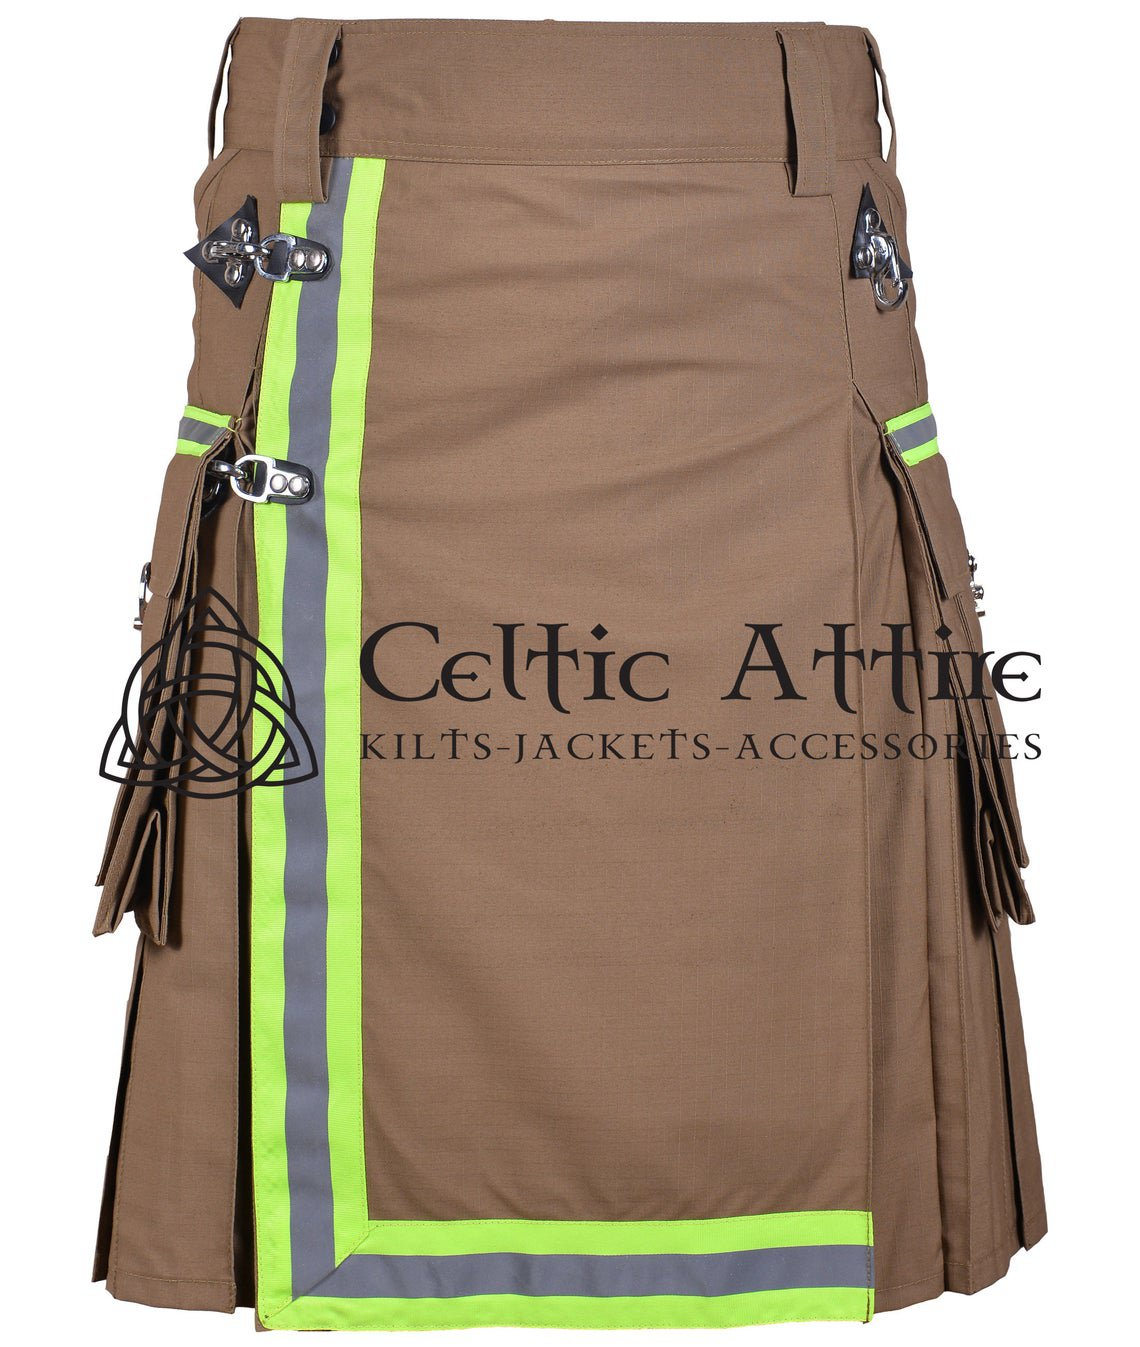 38 Inches waist Scottish Utility Kilt For Men - Fireman Kilt - Fire Department Kilt Khaki